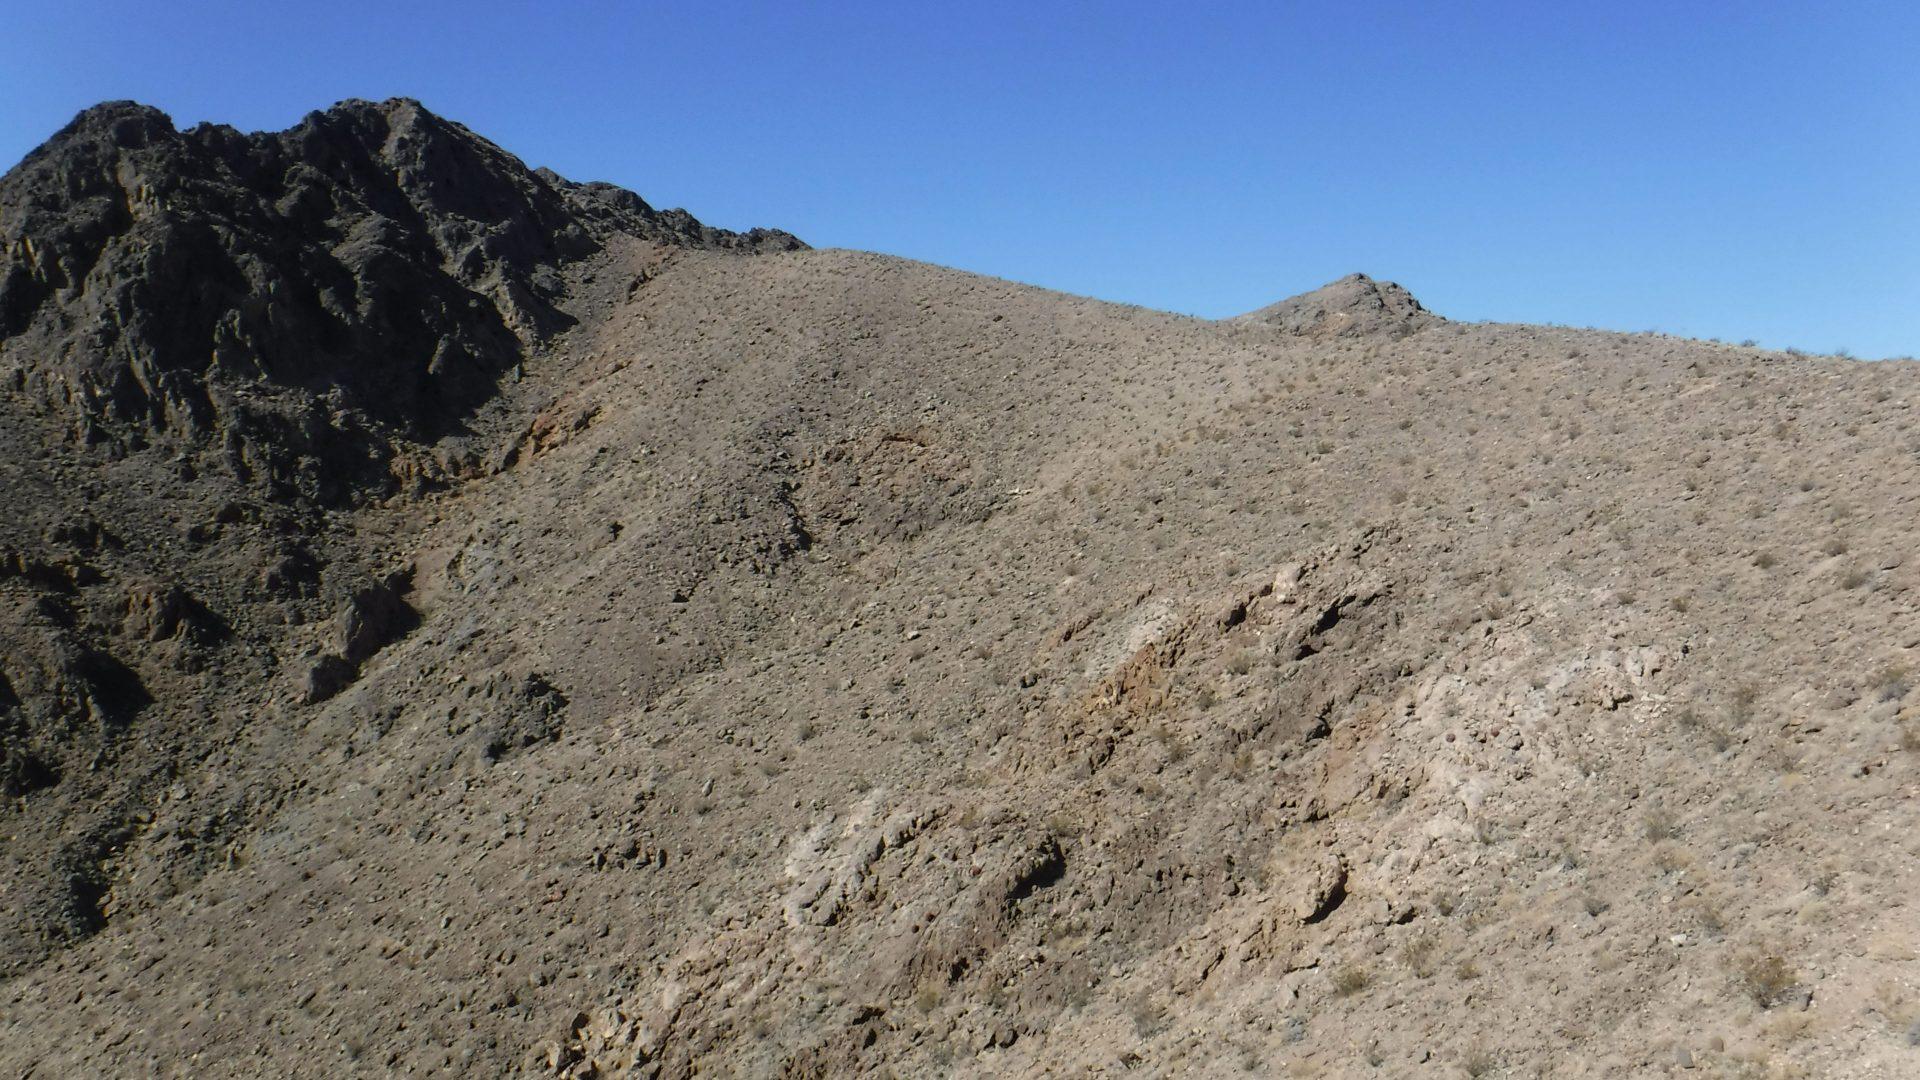 Desert ridgeline with a peak in the background